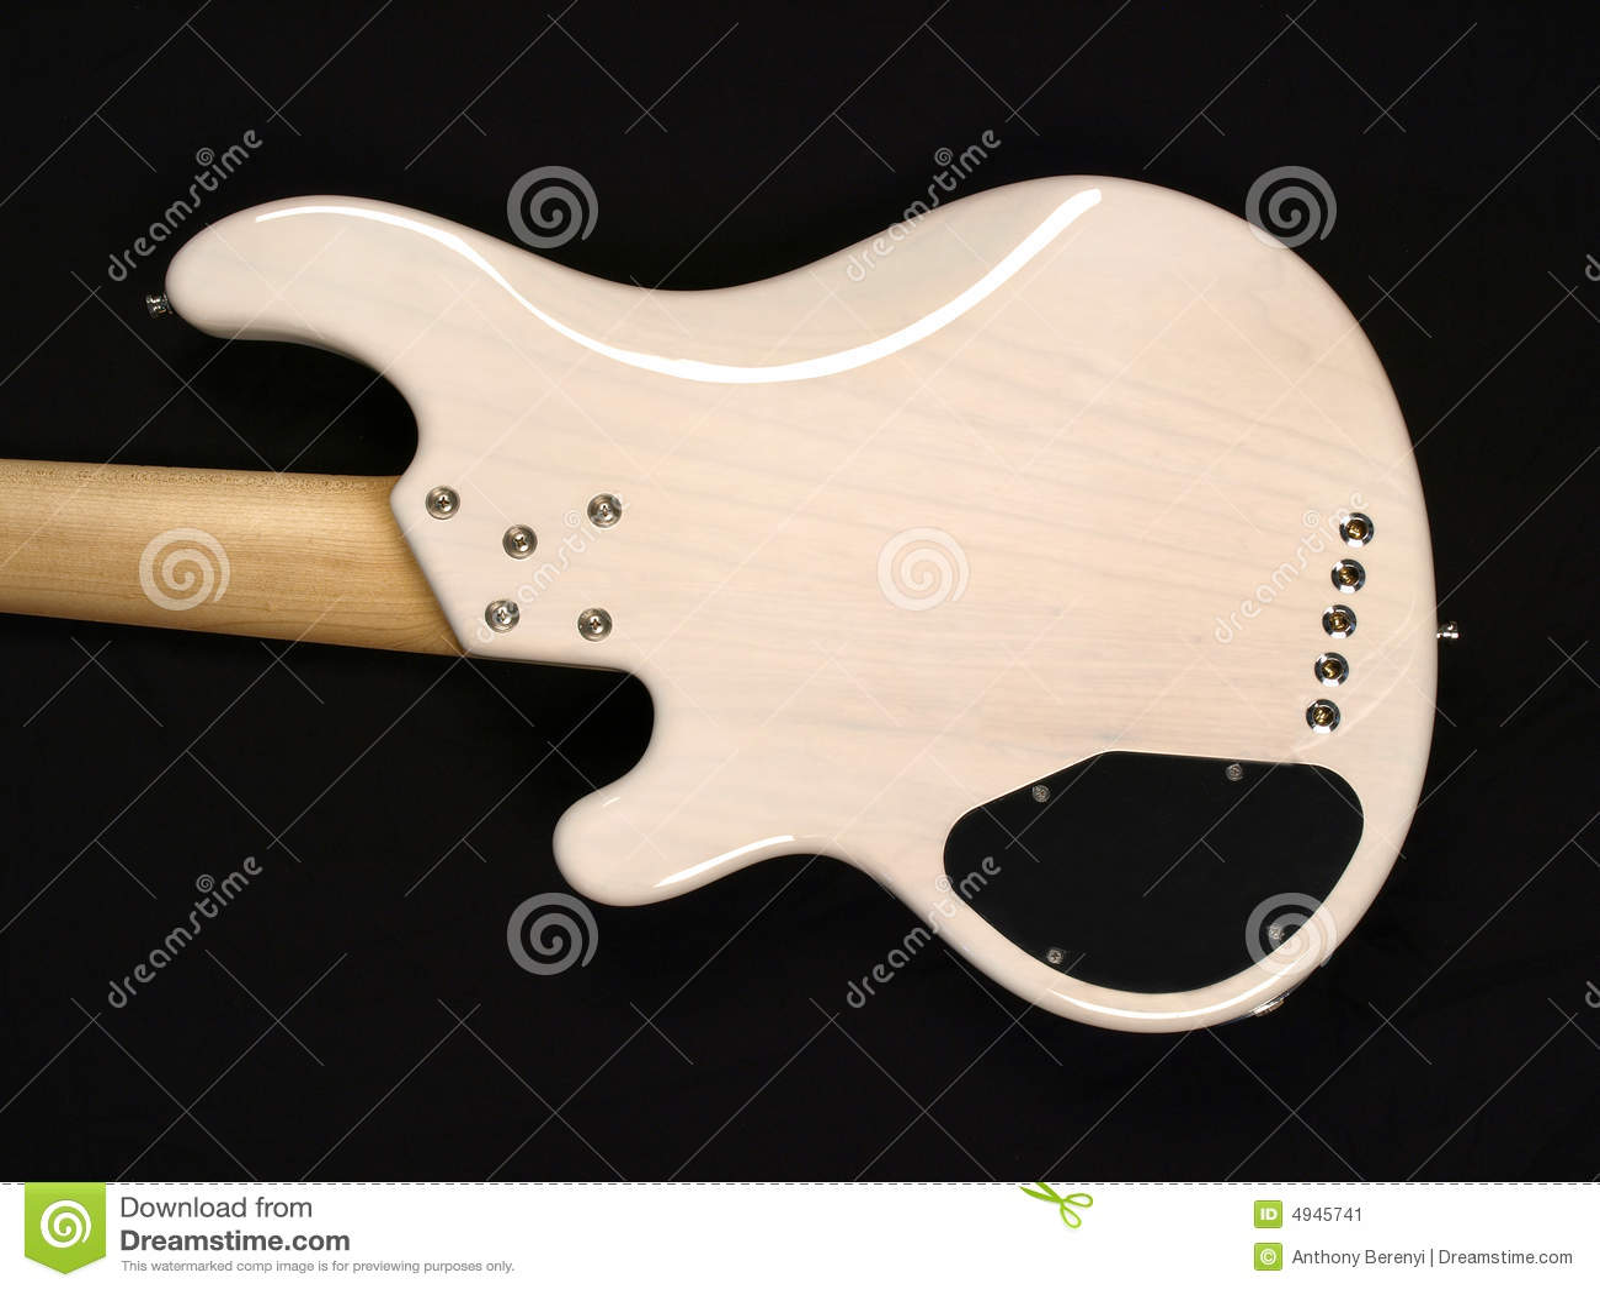 White Bass Guitar body back